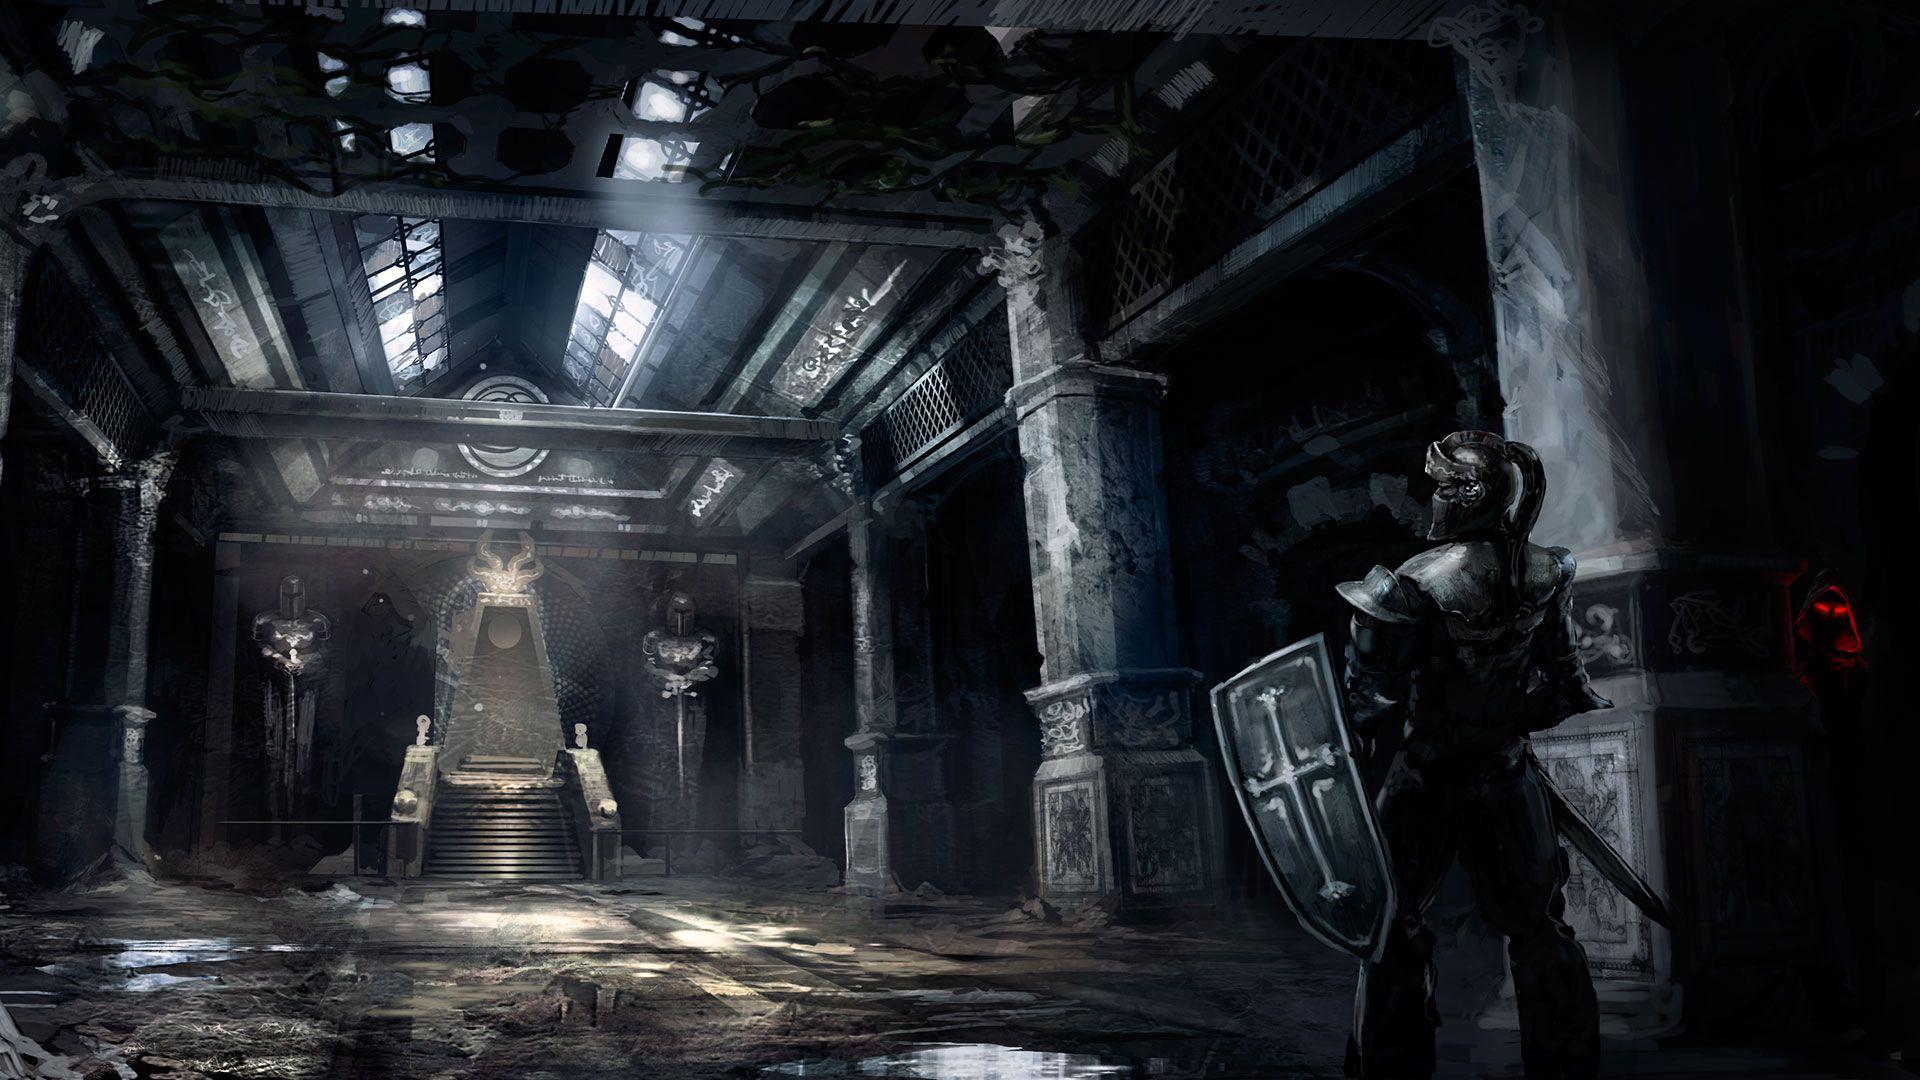 Evil kings throne room - Throne Room